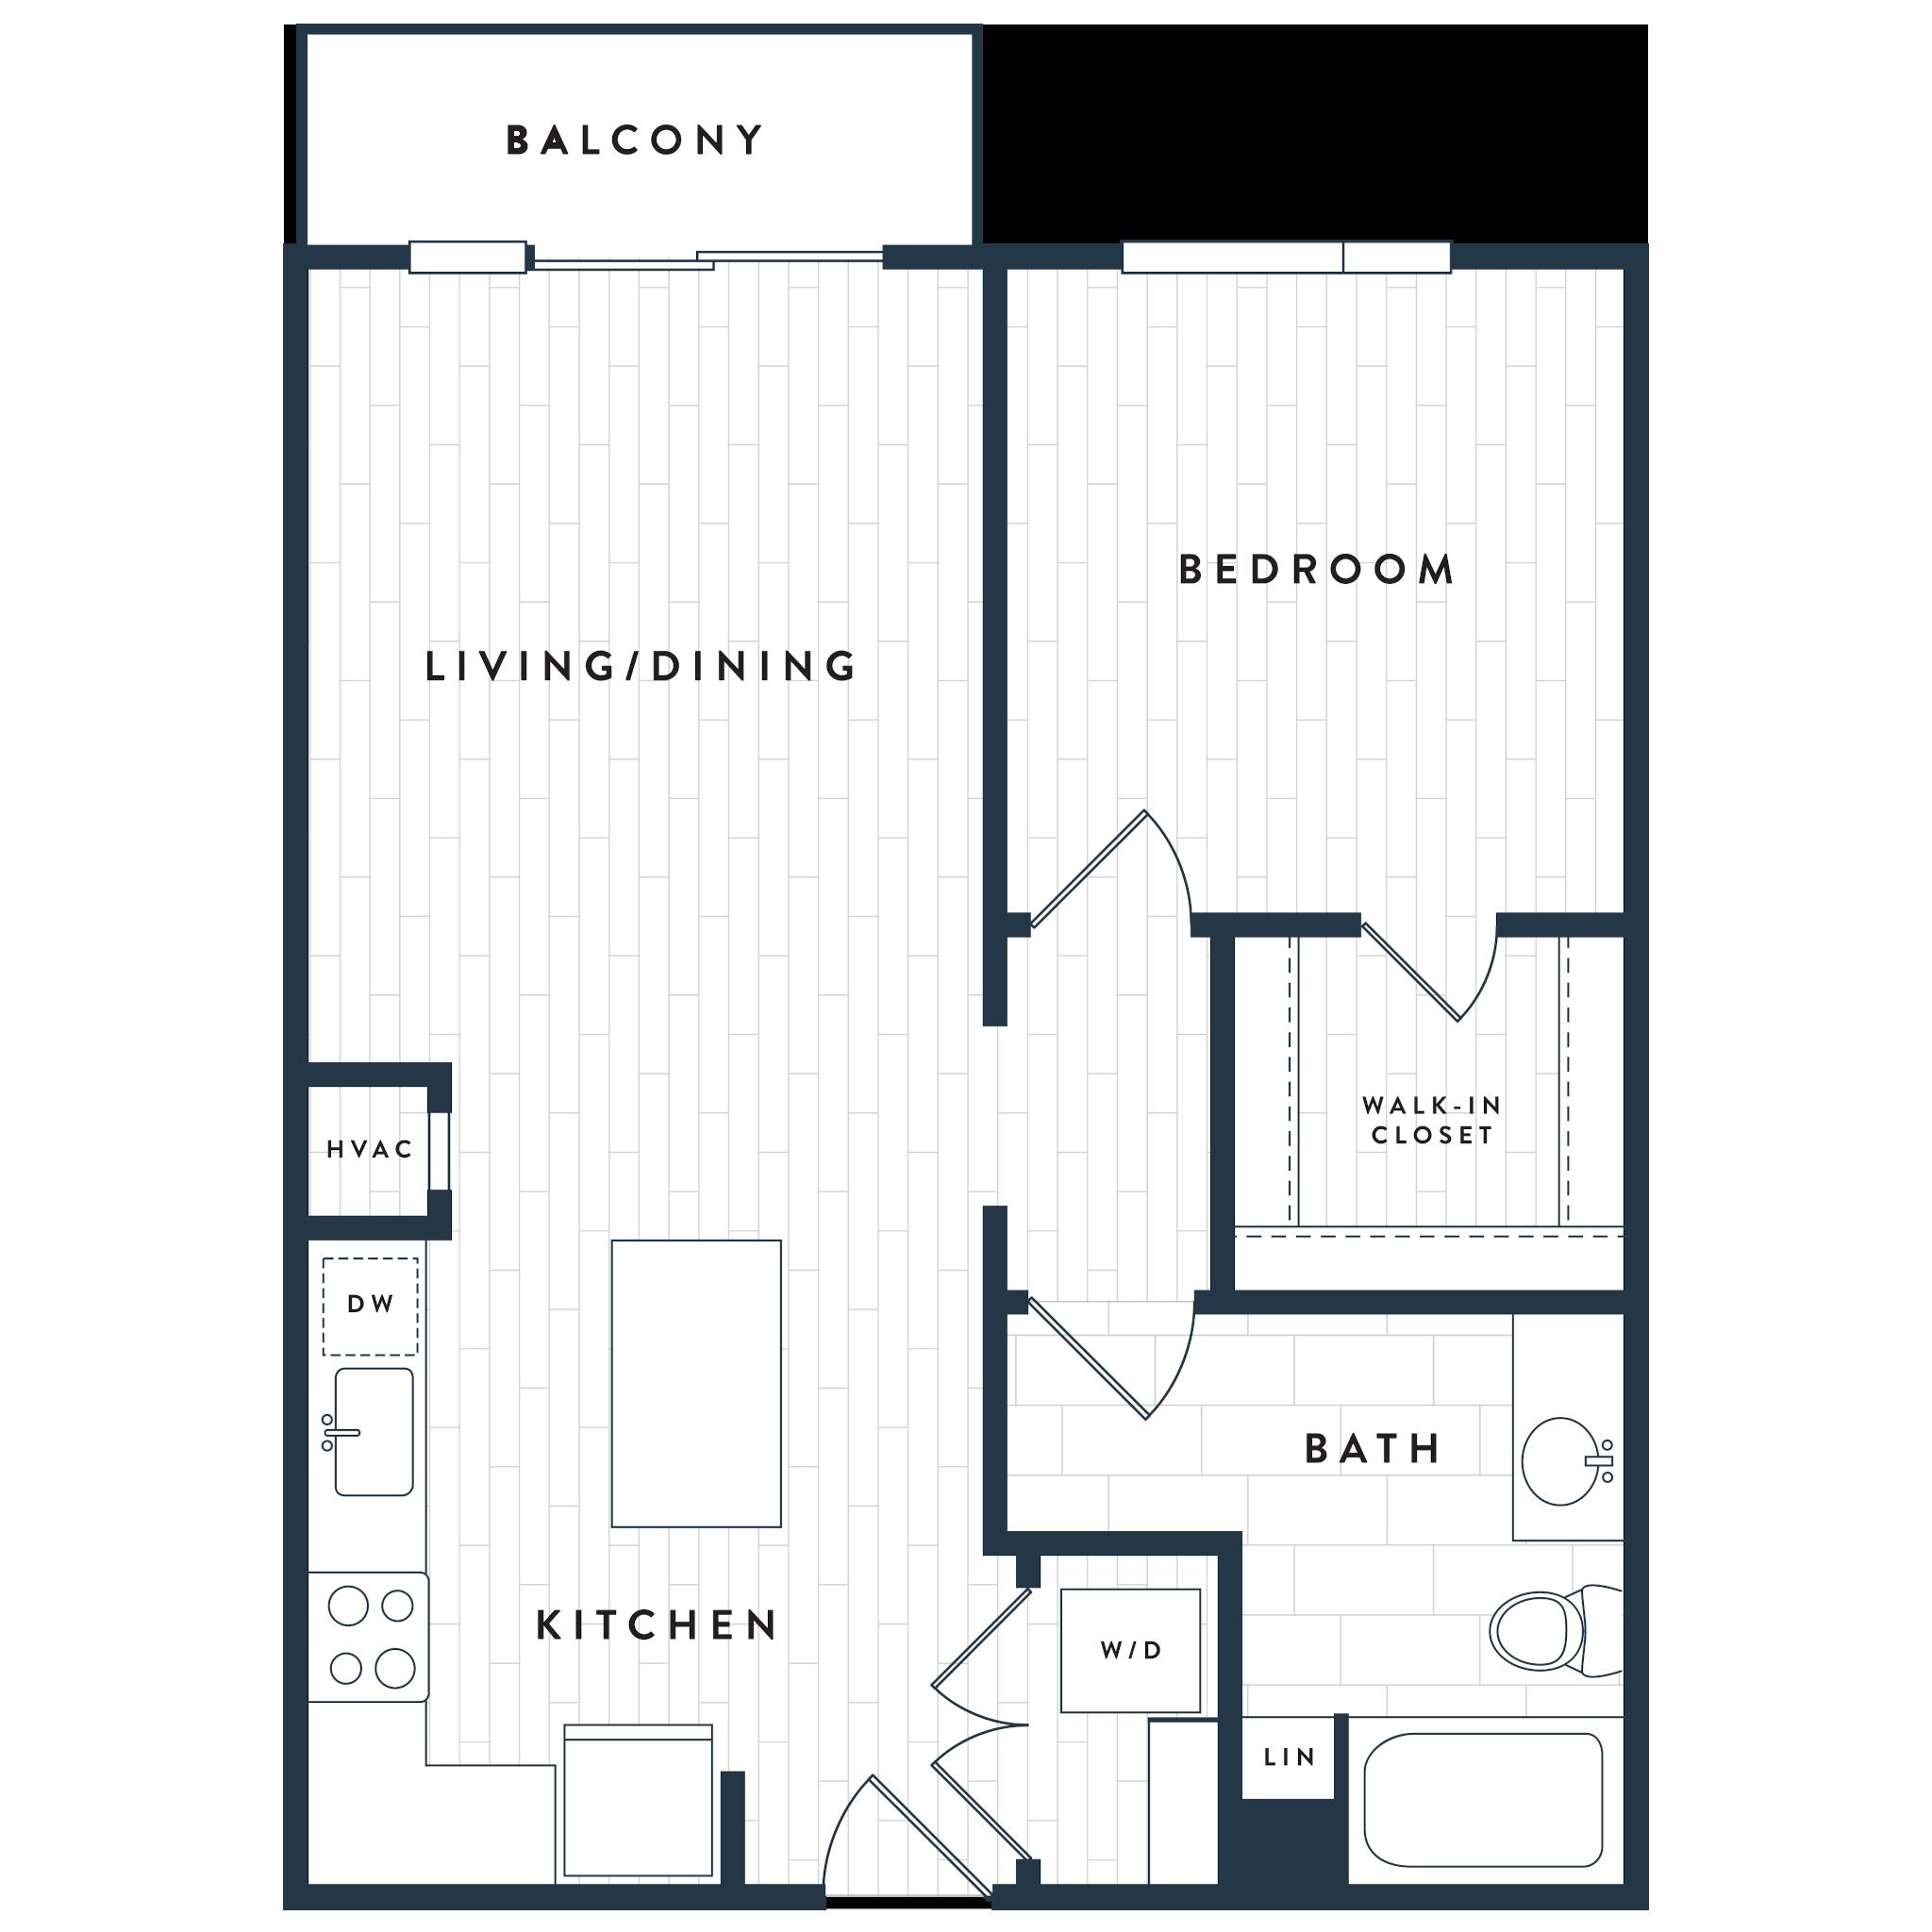 Tangent Apartments Denver Tech Center 1 bedroom 1 bath Plan 1A